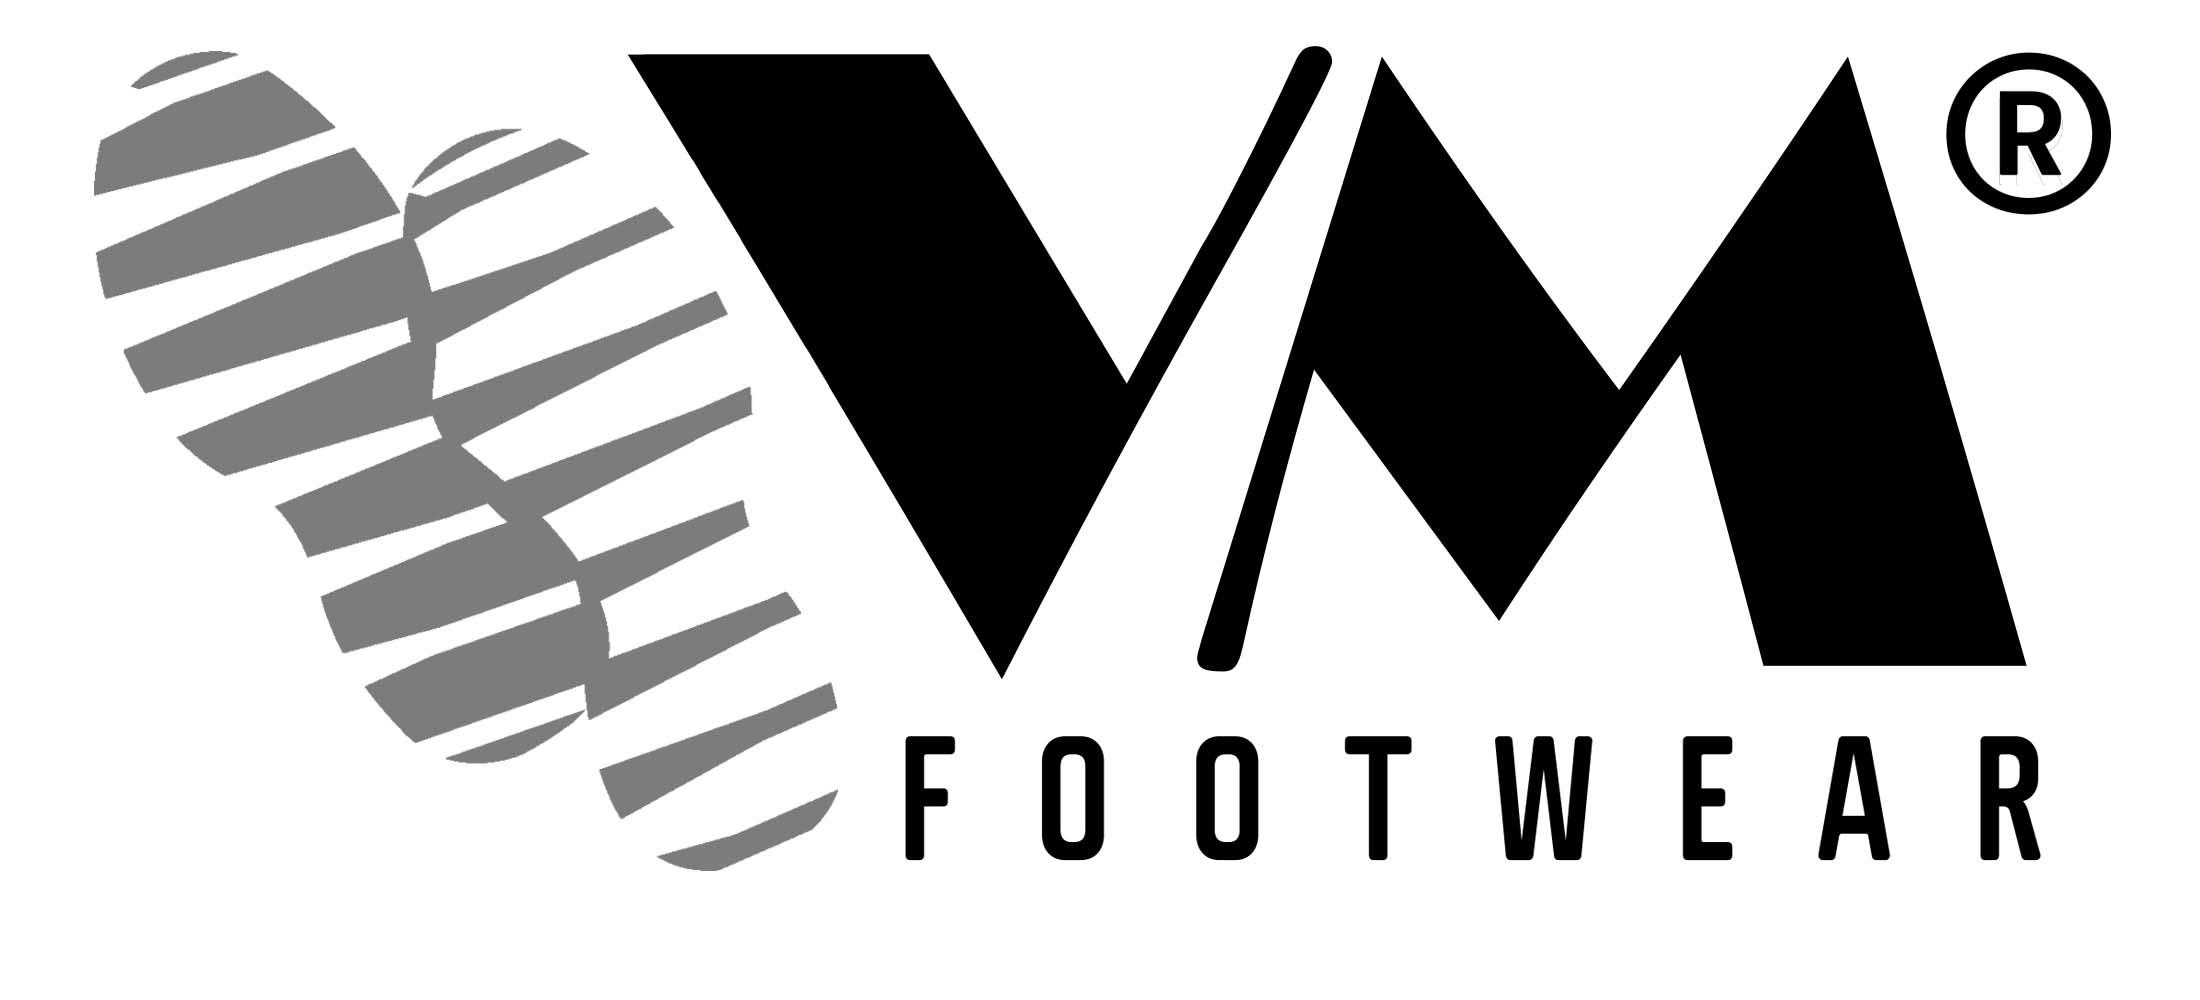 vm-footwear.jpg